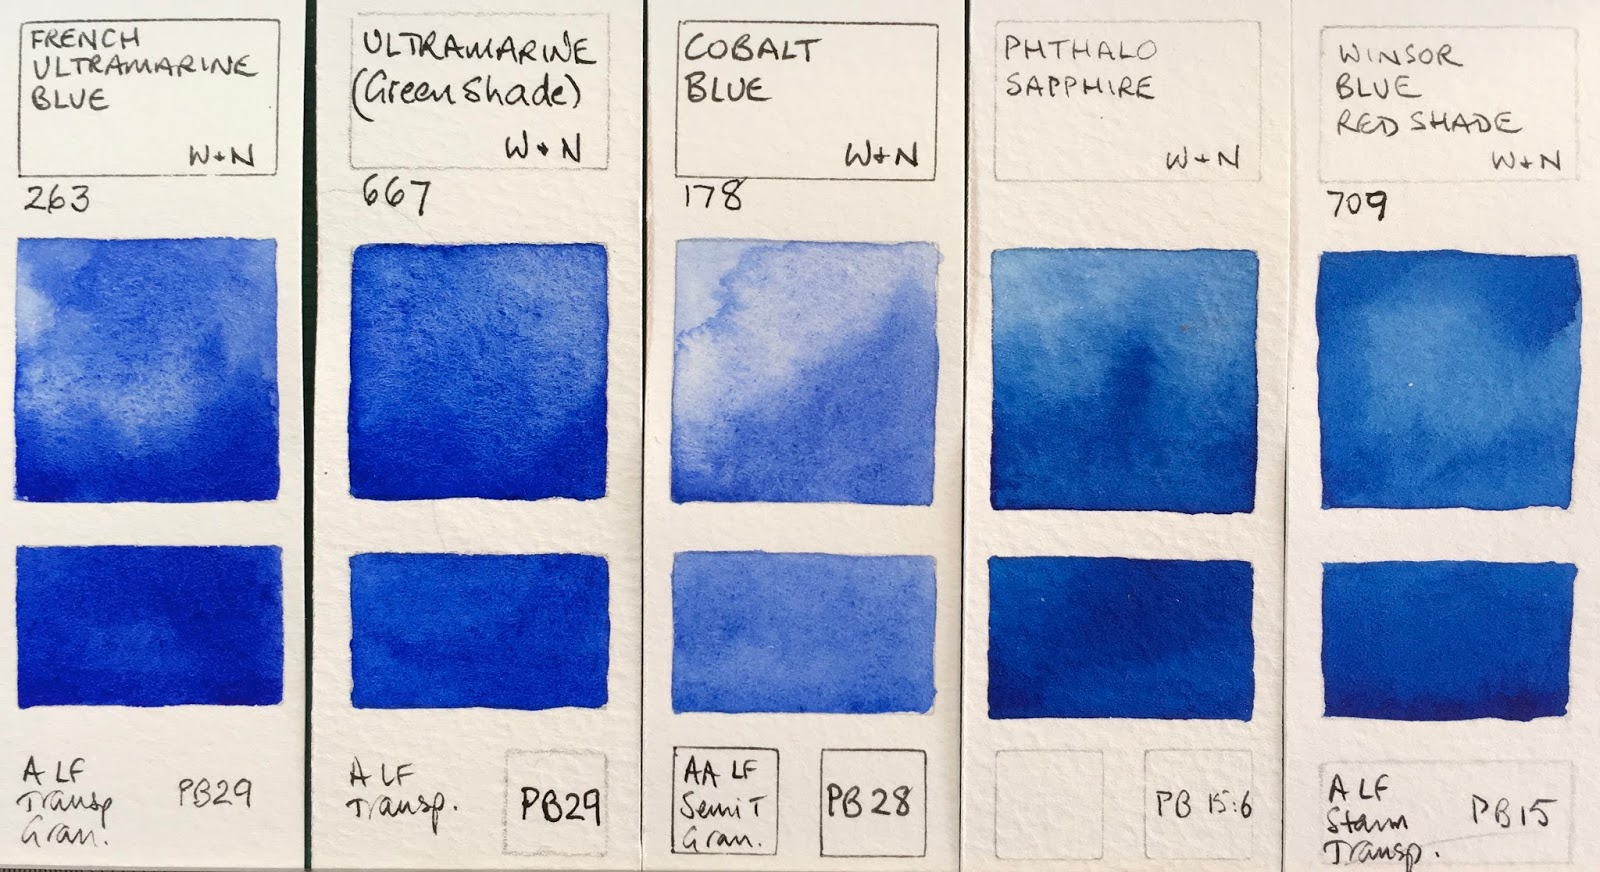 Winsor  newton watercolours french ultramarine green shade cobalt blue phthalo sapphire red also jane blundell artist full range rh janeblundellartspot